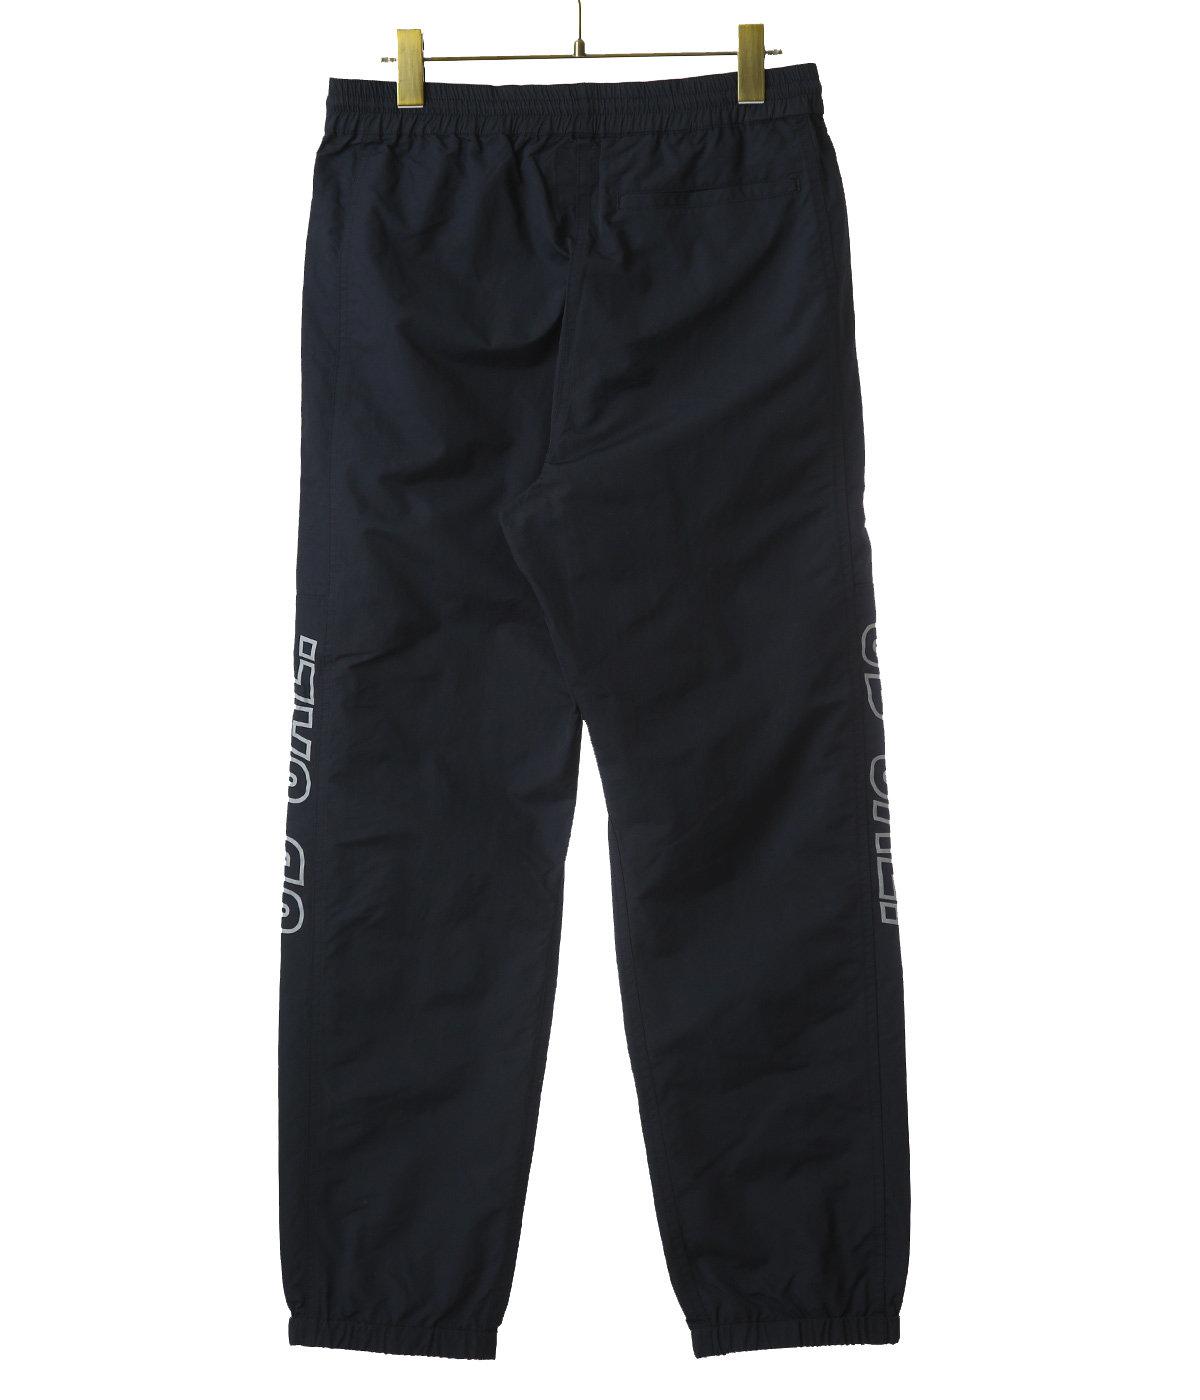 SD SPORTS TRACK PANTS